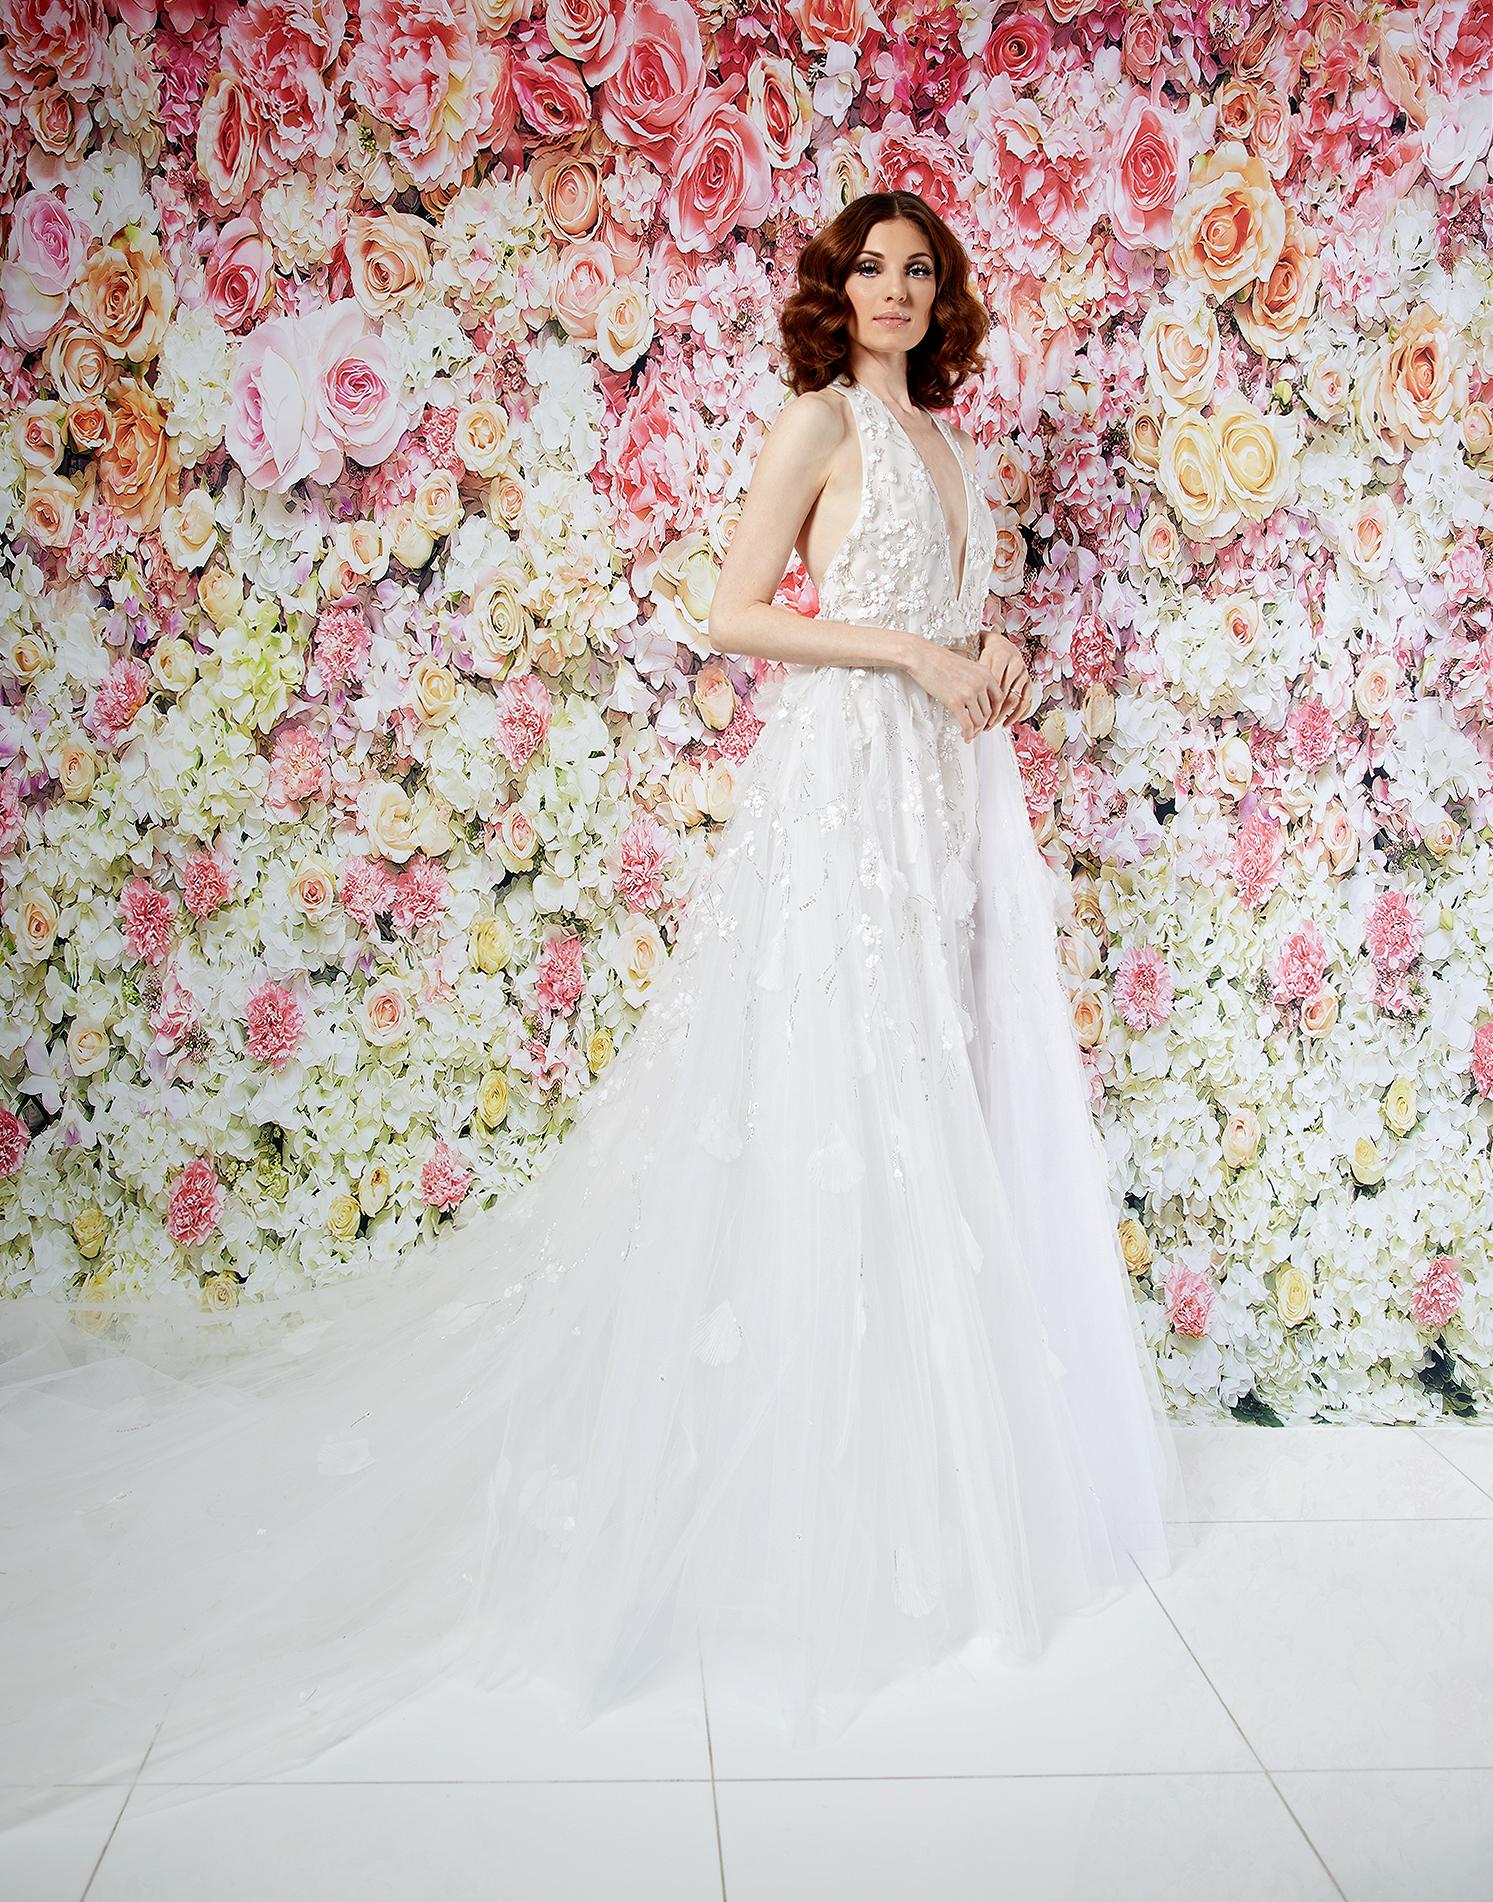 randi rahm wedding dress spring 2019 plunging v-neck halter applique